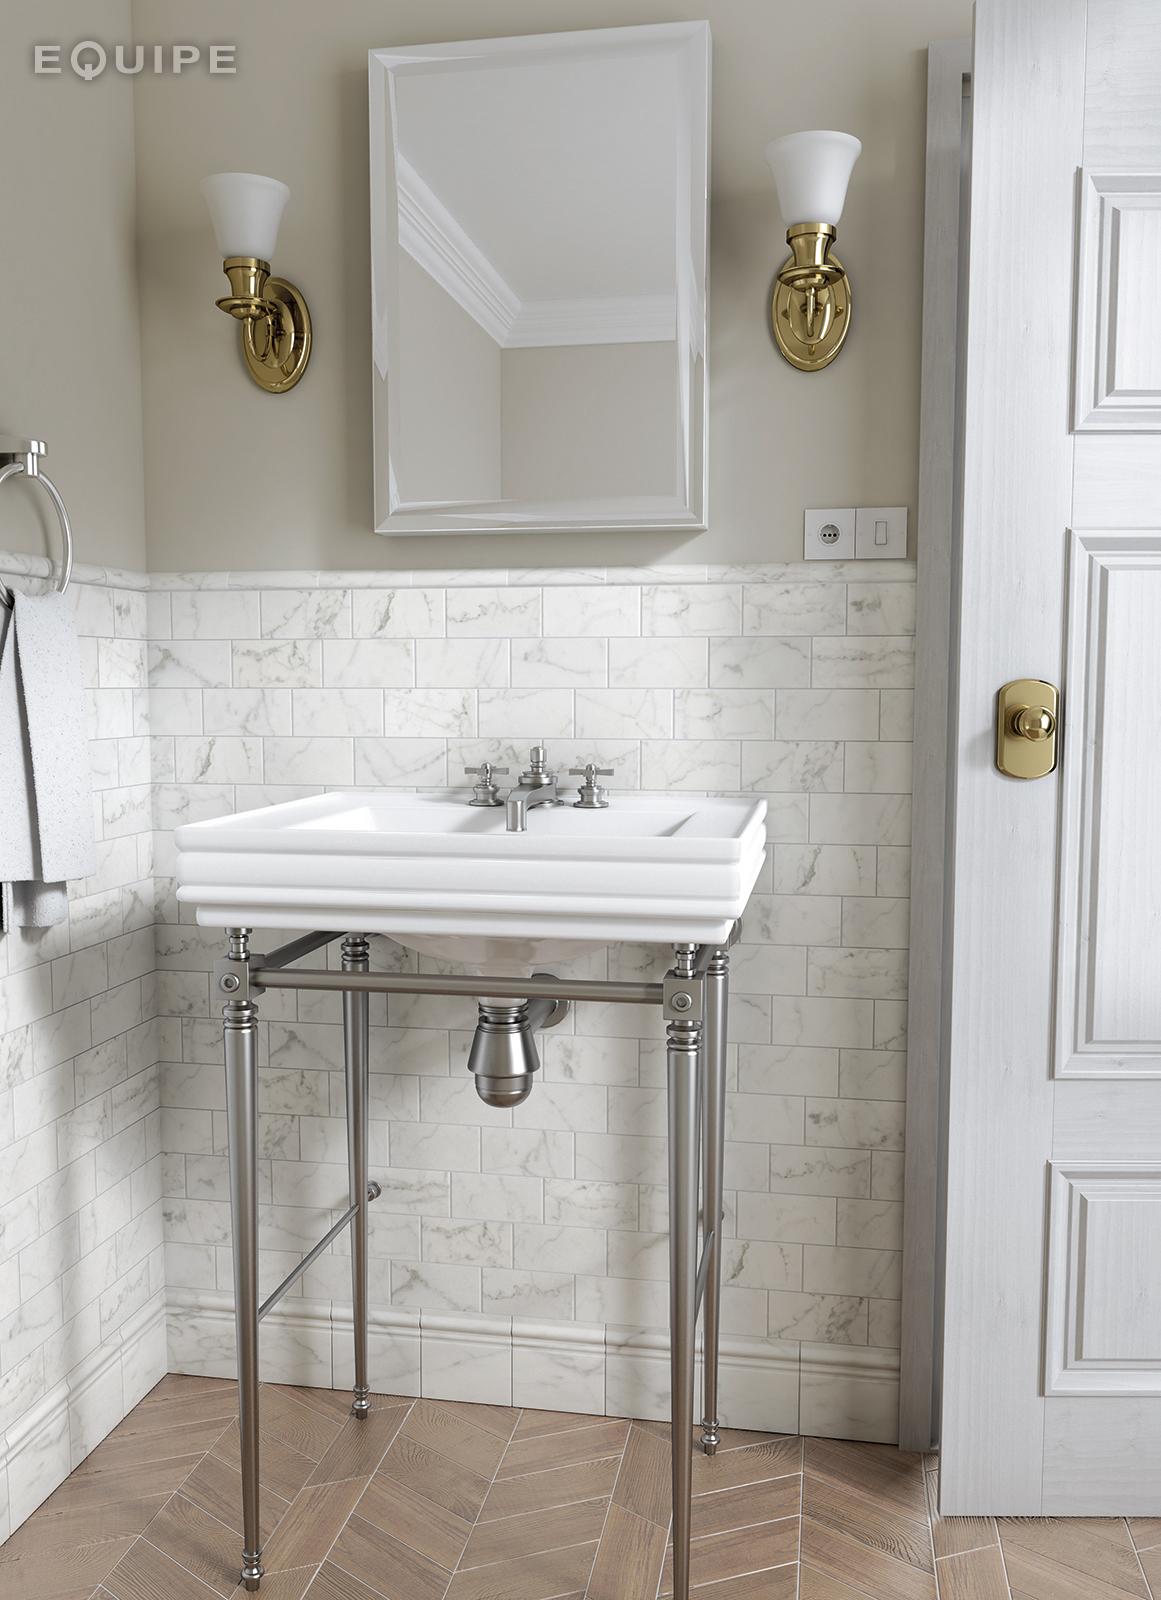 Carrara7,5x15 matt bath